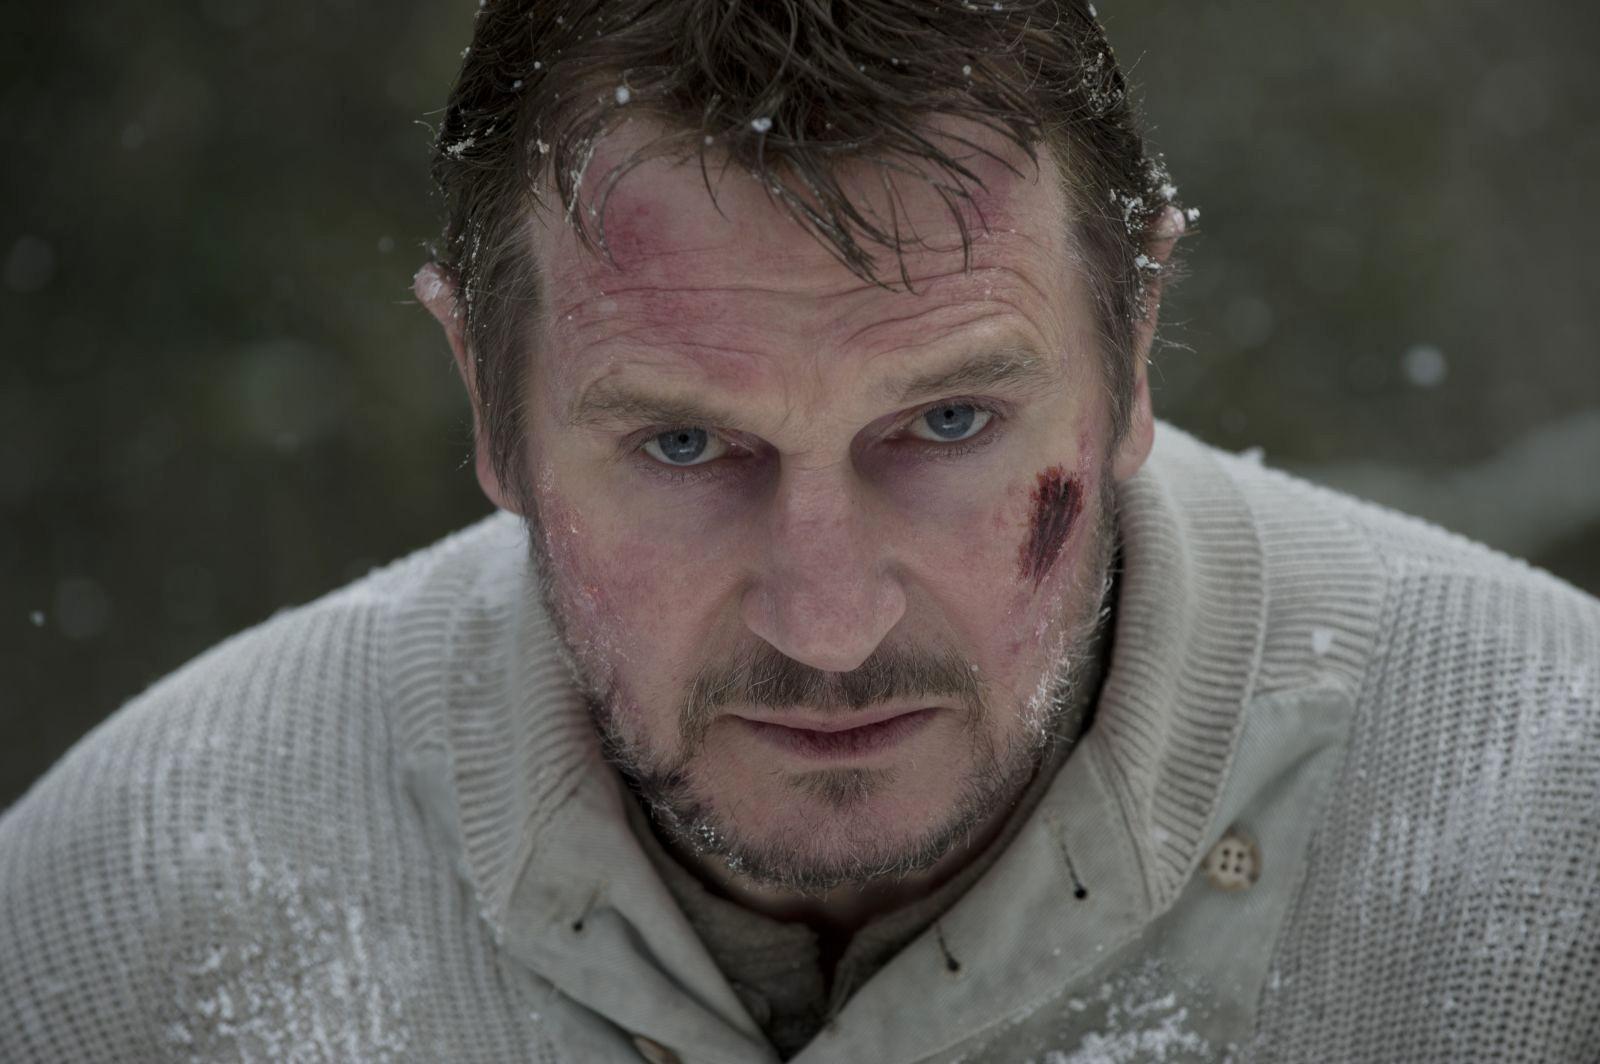 http://2.bp.blogspot.com/-YBLXUqUu5w8/Tvgane0izrI/AAAAAAAAQH8/aDy619K7JJw/s1600/The-Grey-Liam-Neeson-3.jpg